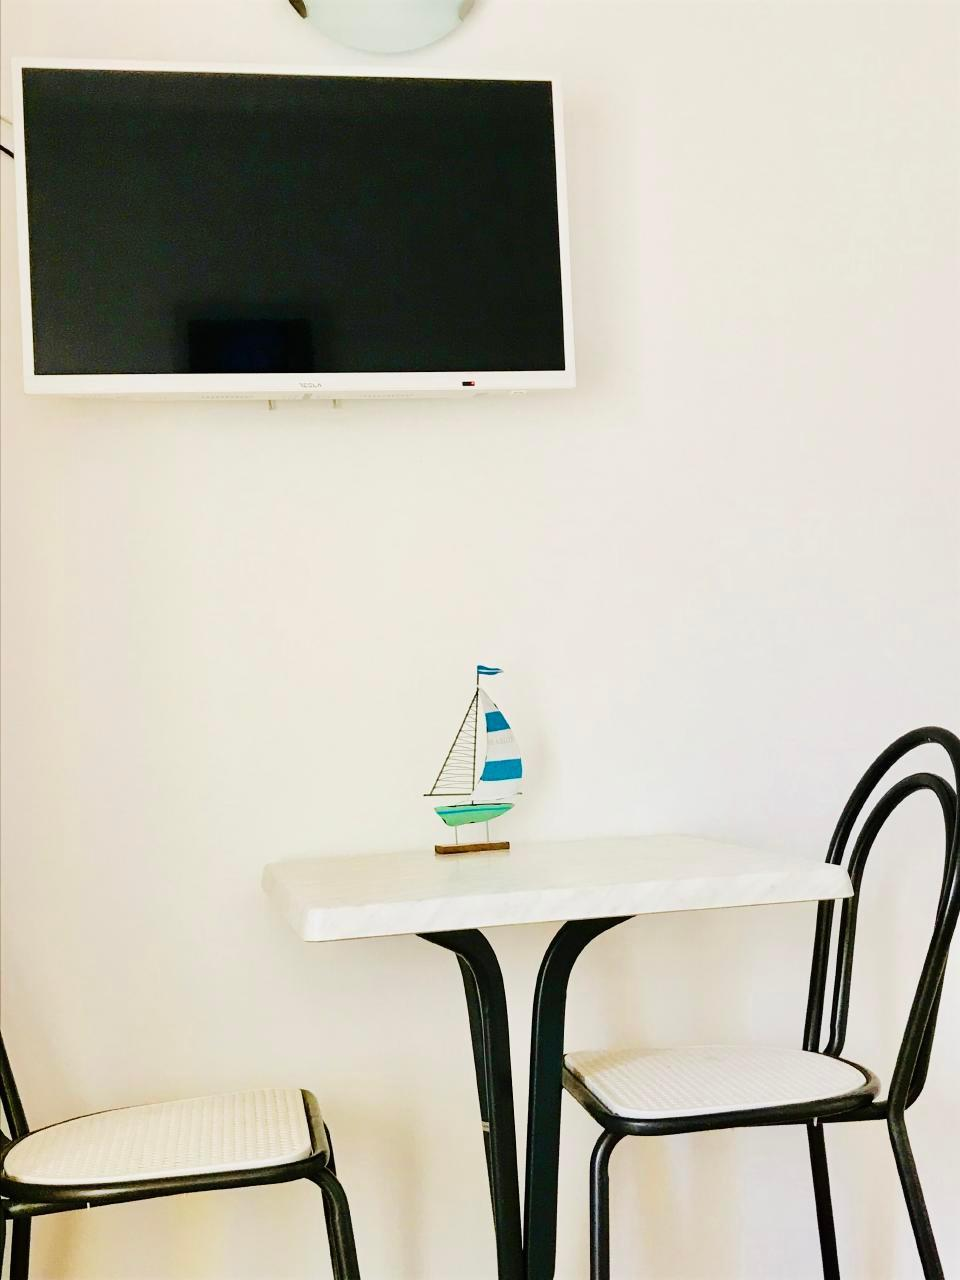 Ferienwohnung Apartmenthaus Ruza 3 - Studio (98391), Kaštel Štafilić, , Dalmatien, Kroatien, Bild 49